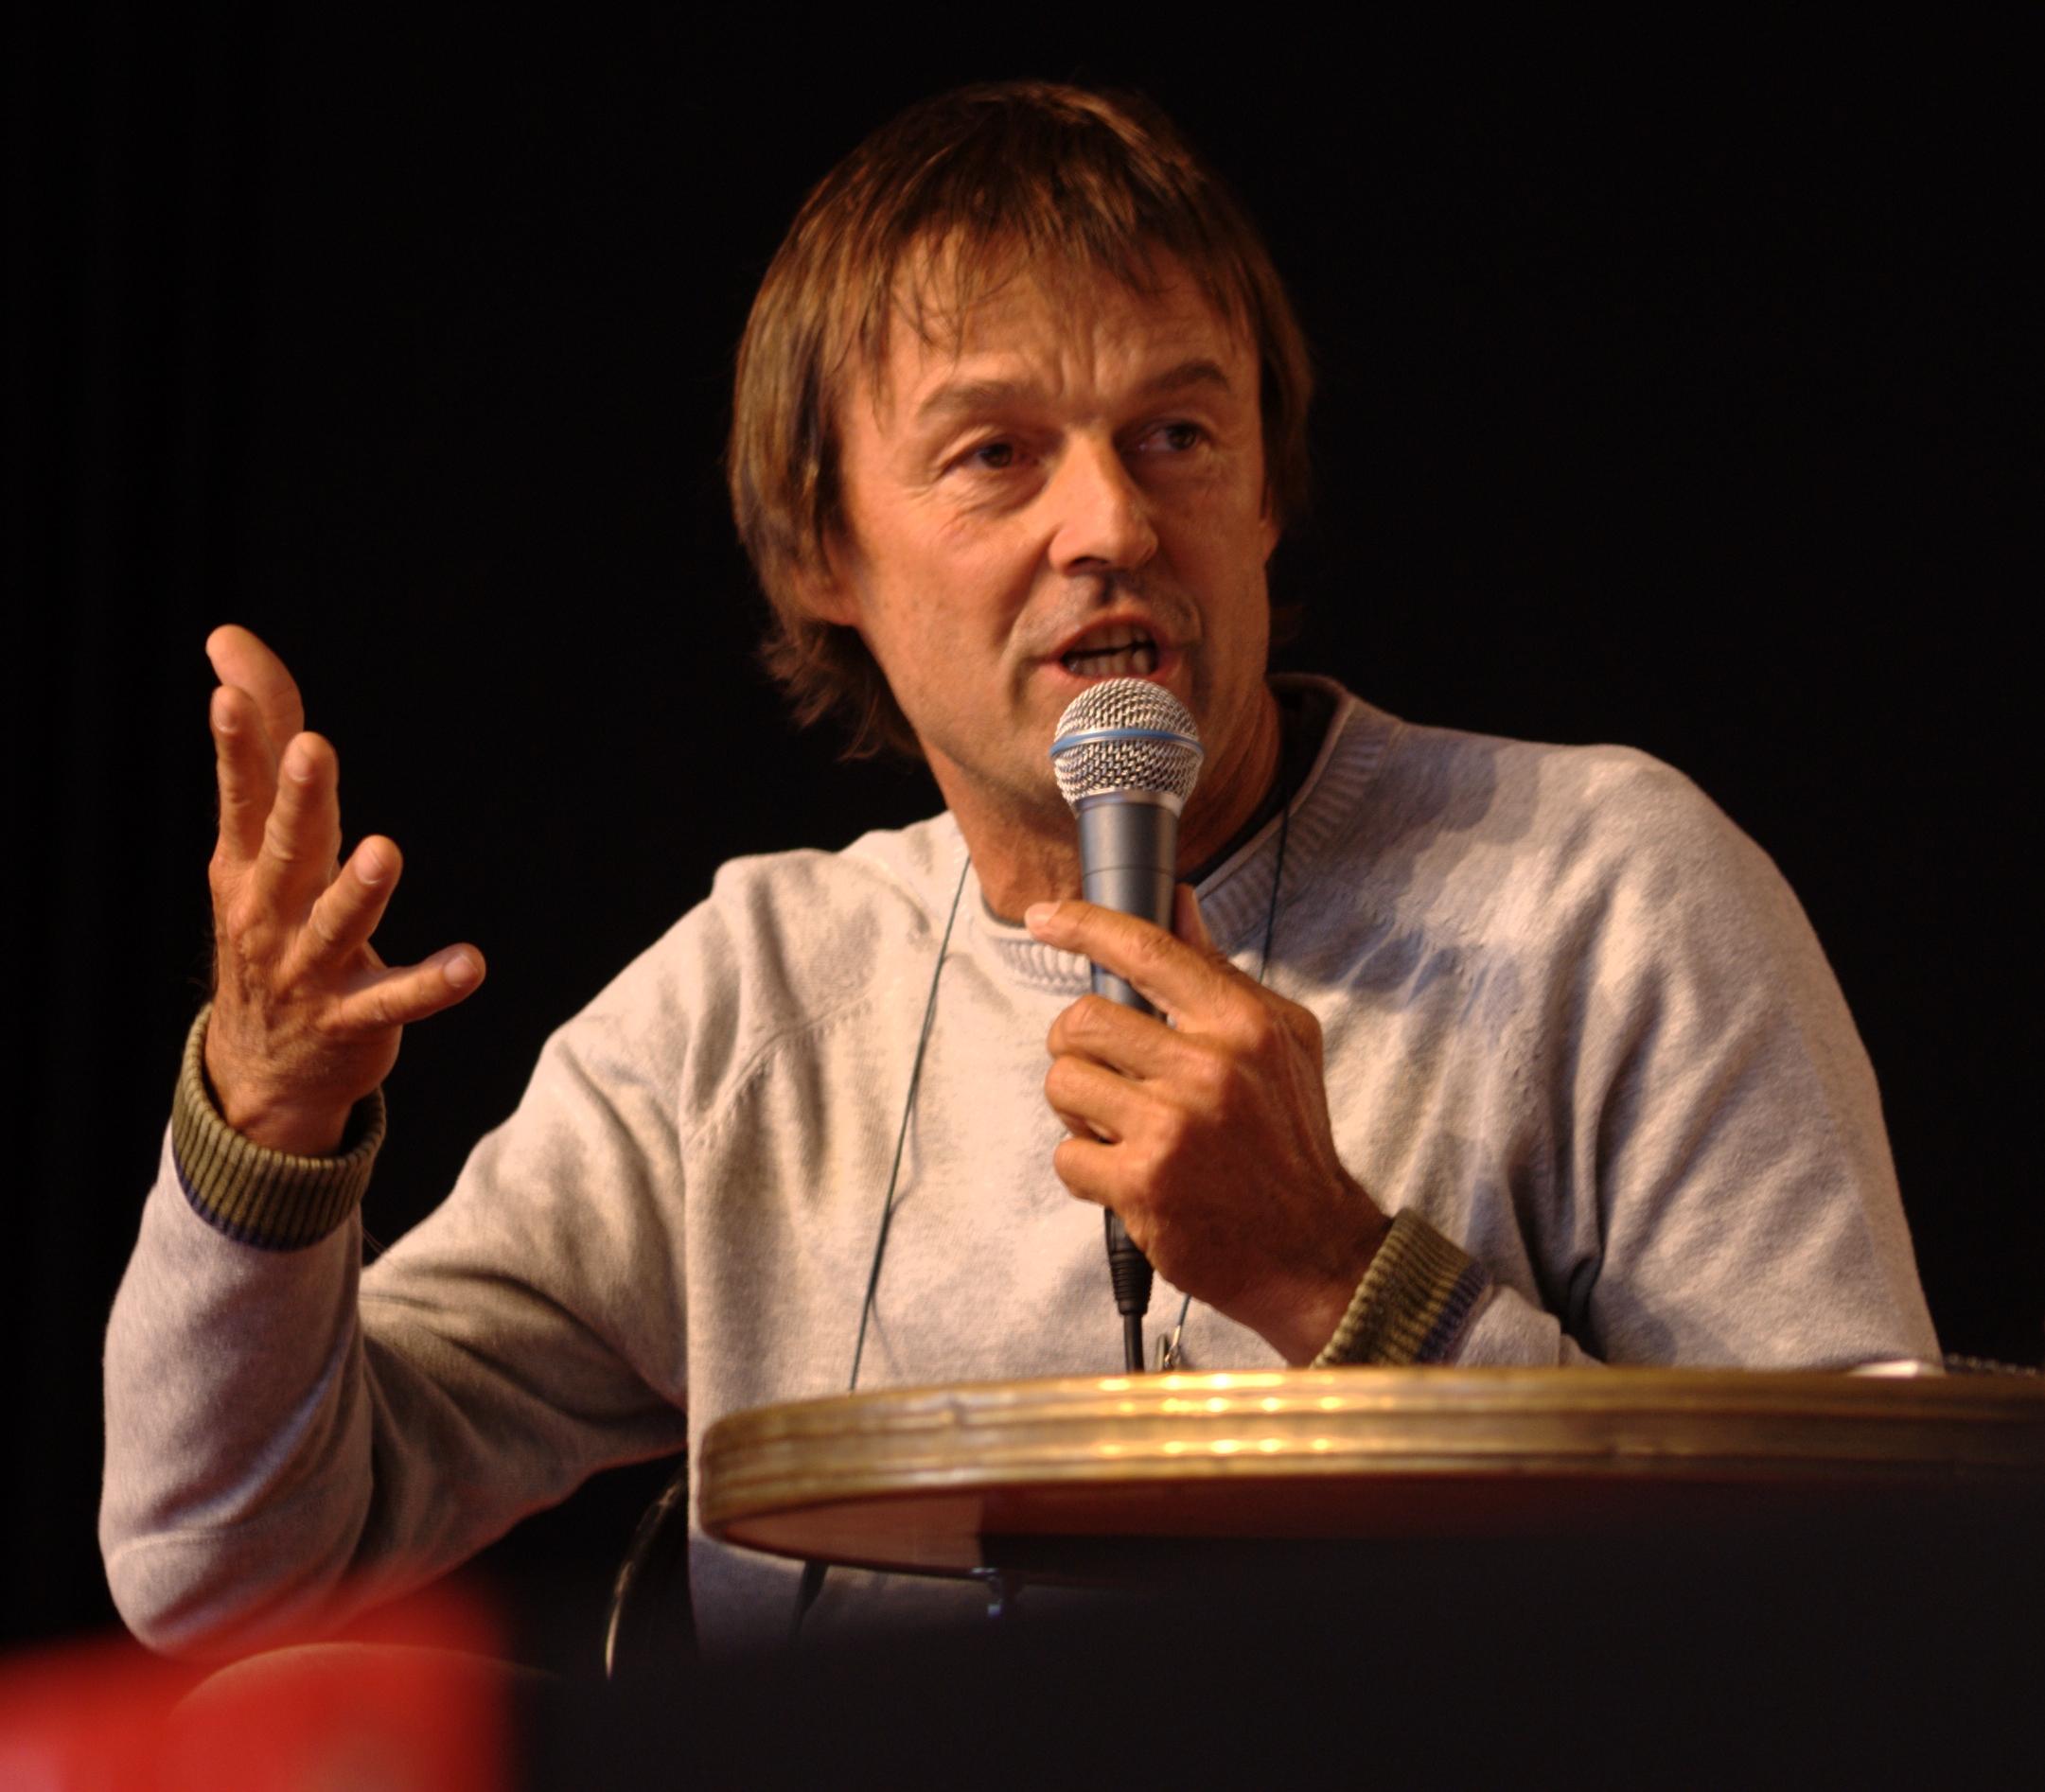 Image of Nicolas Hulot from Wikidata